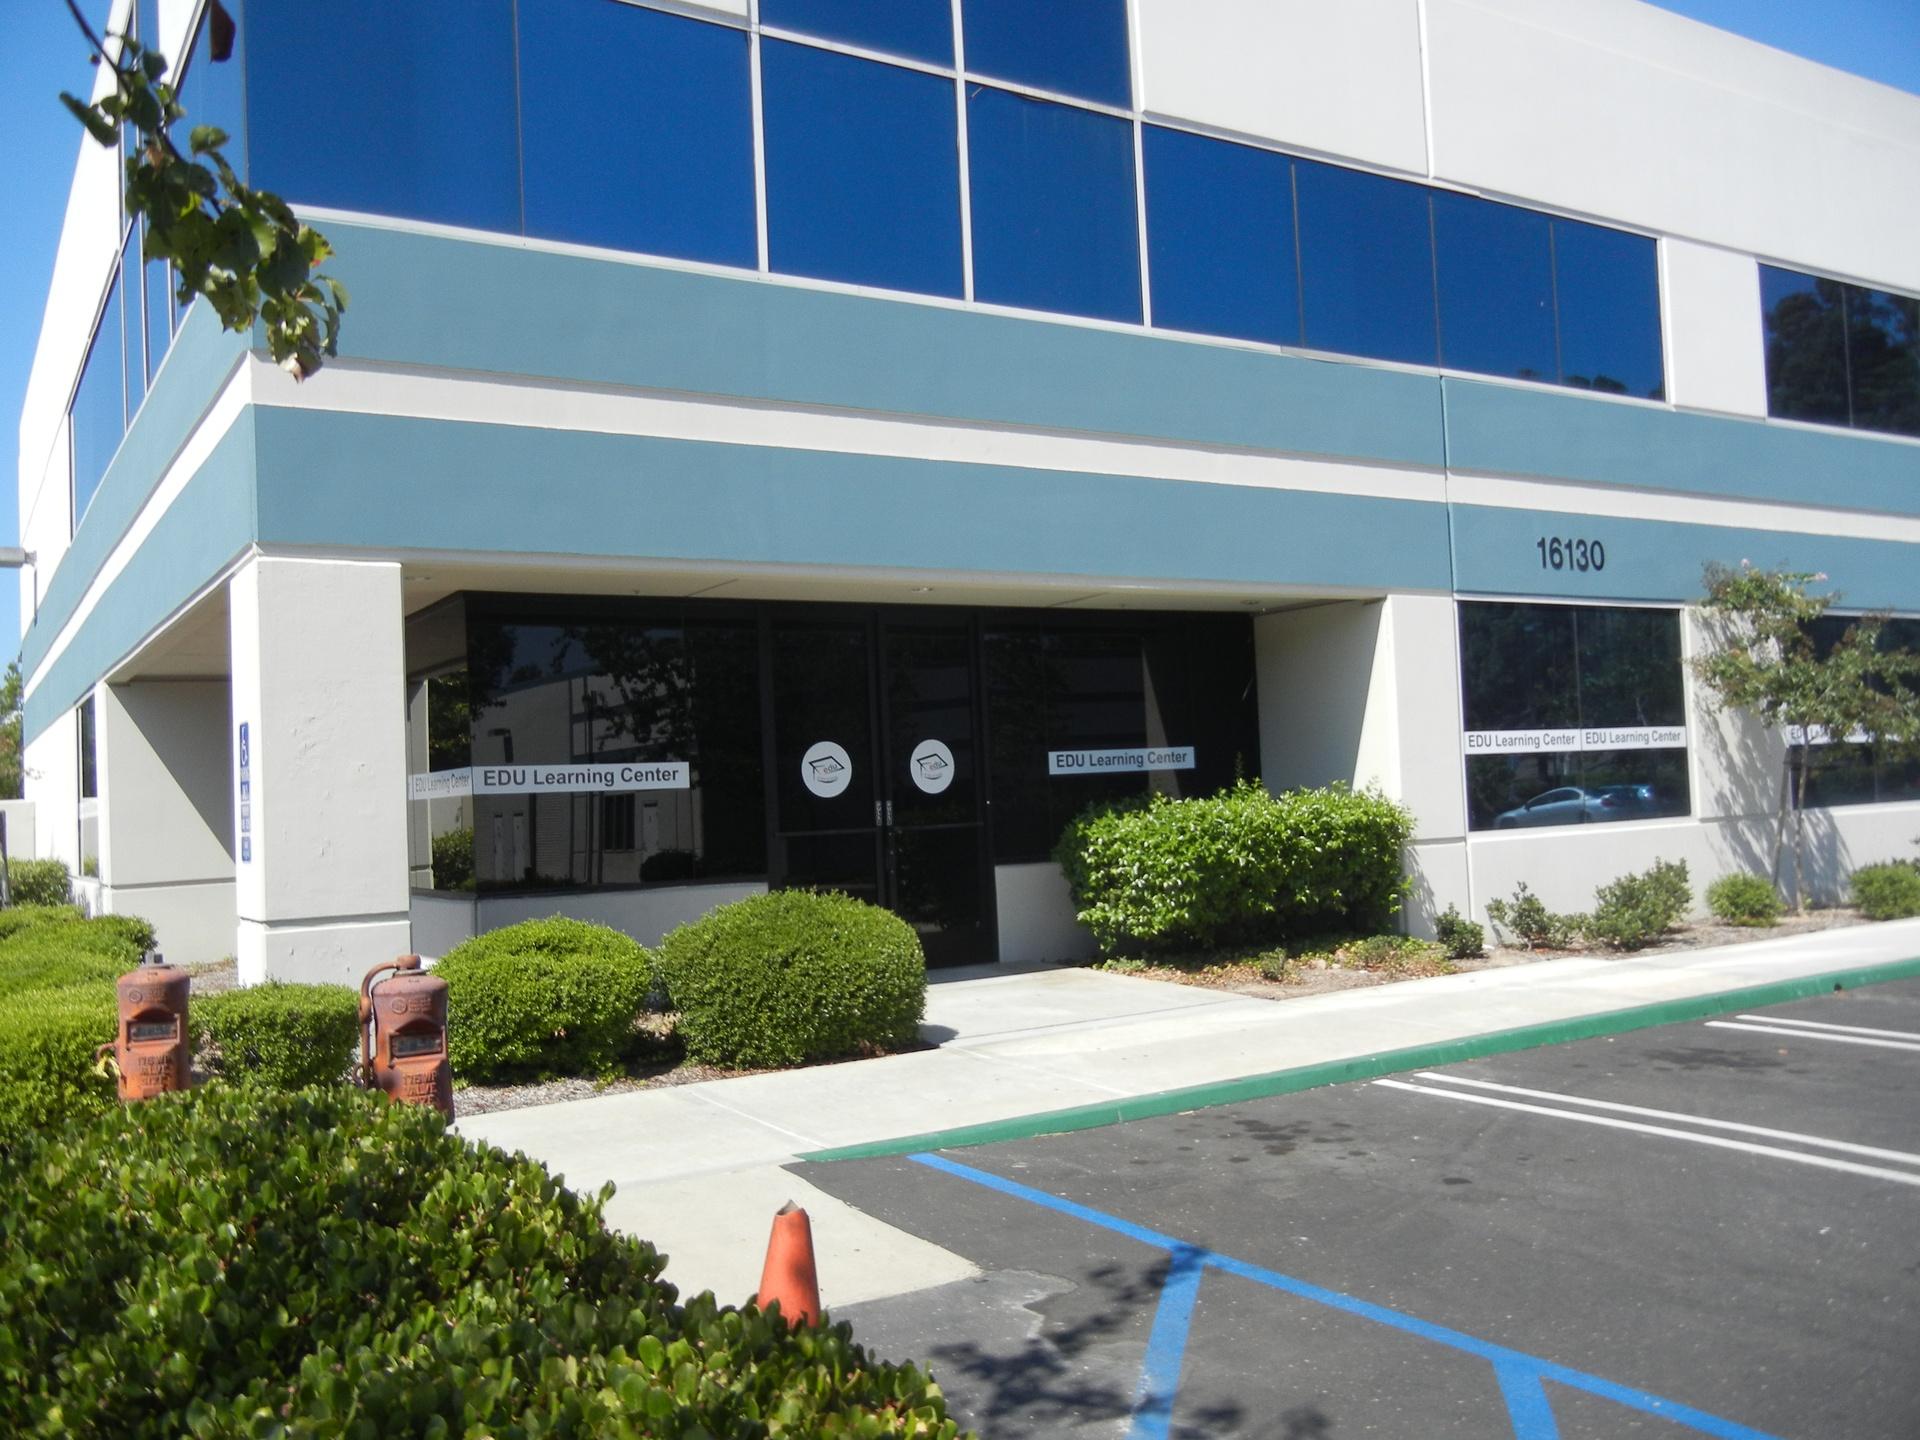 Elite Tae Kwon Do Academy (EDU Learning Center), 16130 W. Bernardo Dr., San Diego, CA, 92127, Rancho Bernardo / 4S Ranch